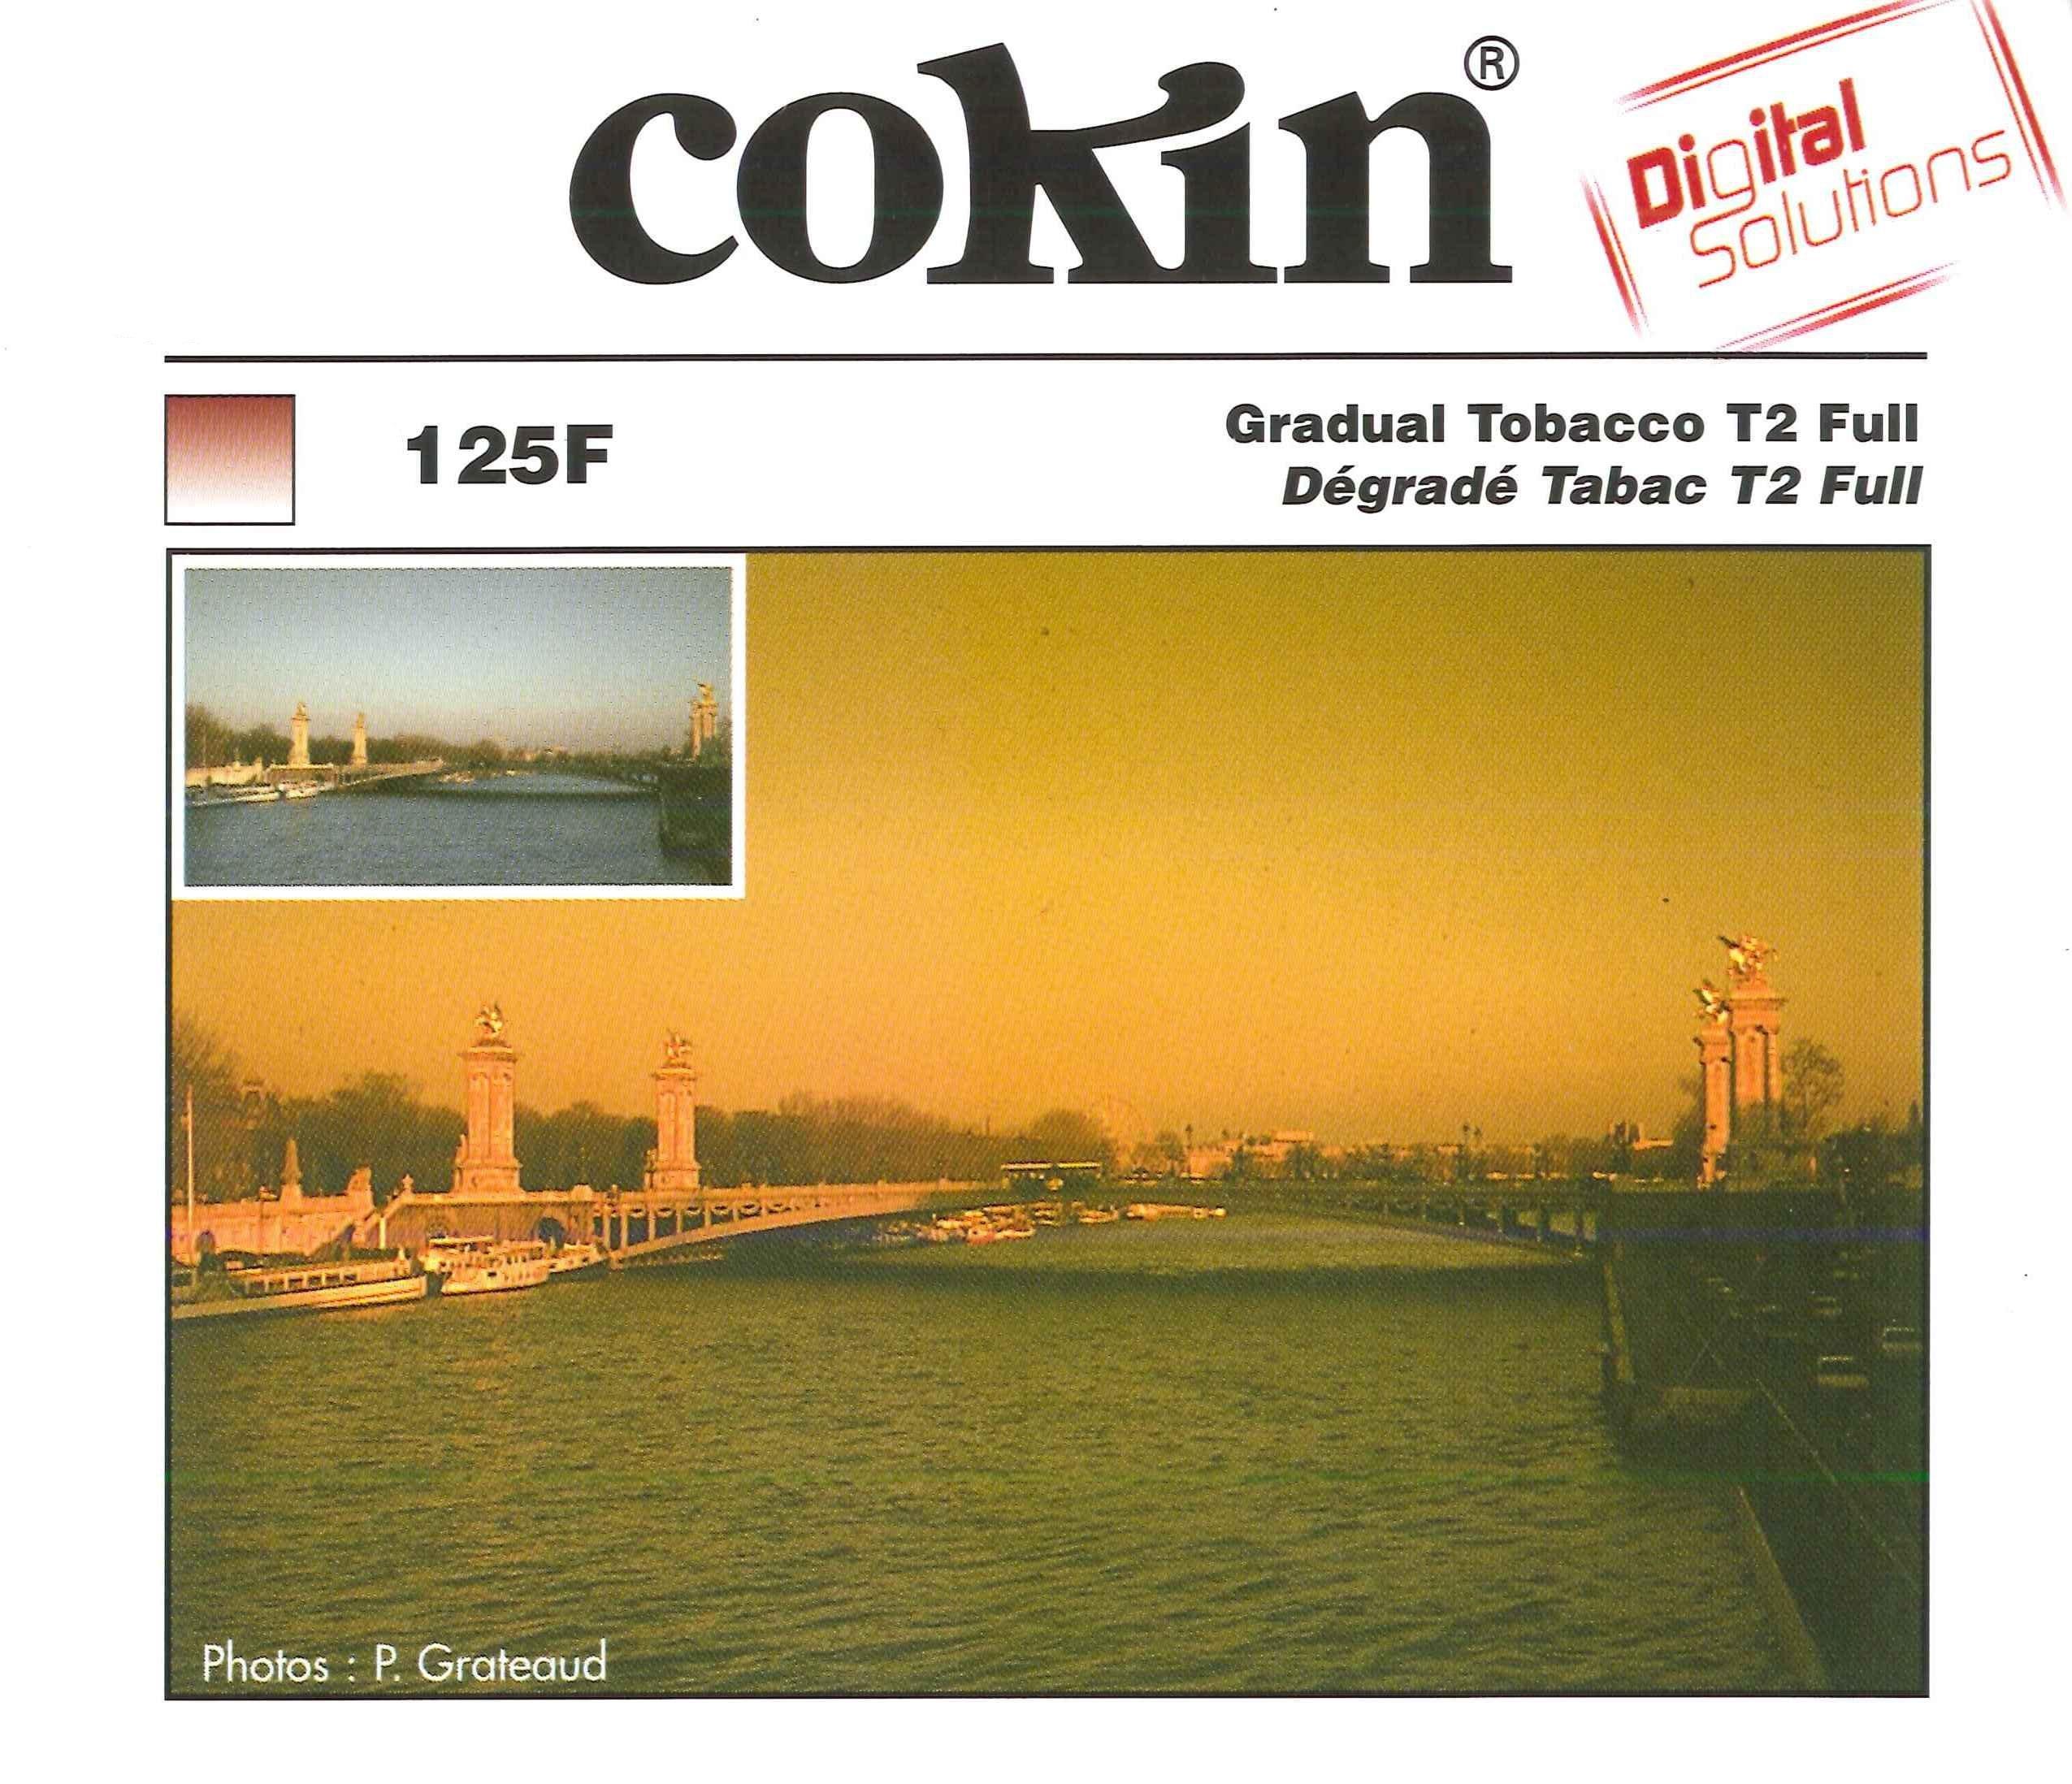 Cokin A125F Filter, A, Tobacco Grad. T2 Full by Cokin